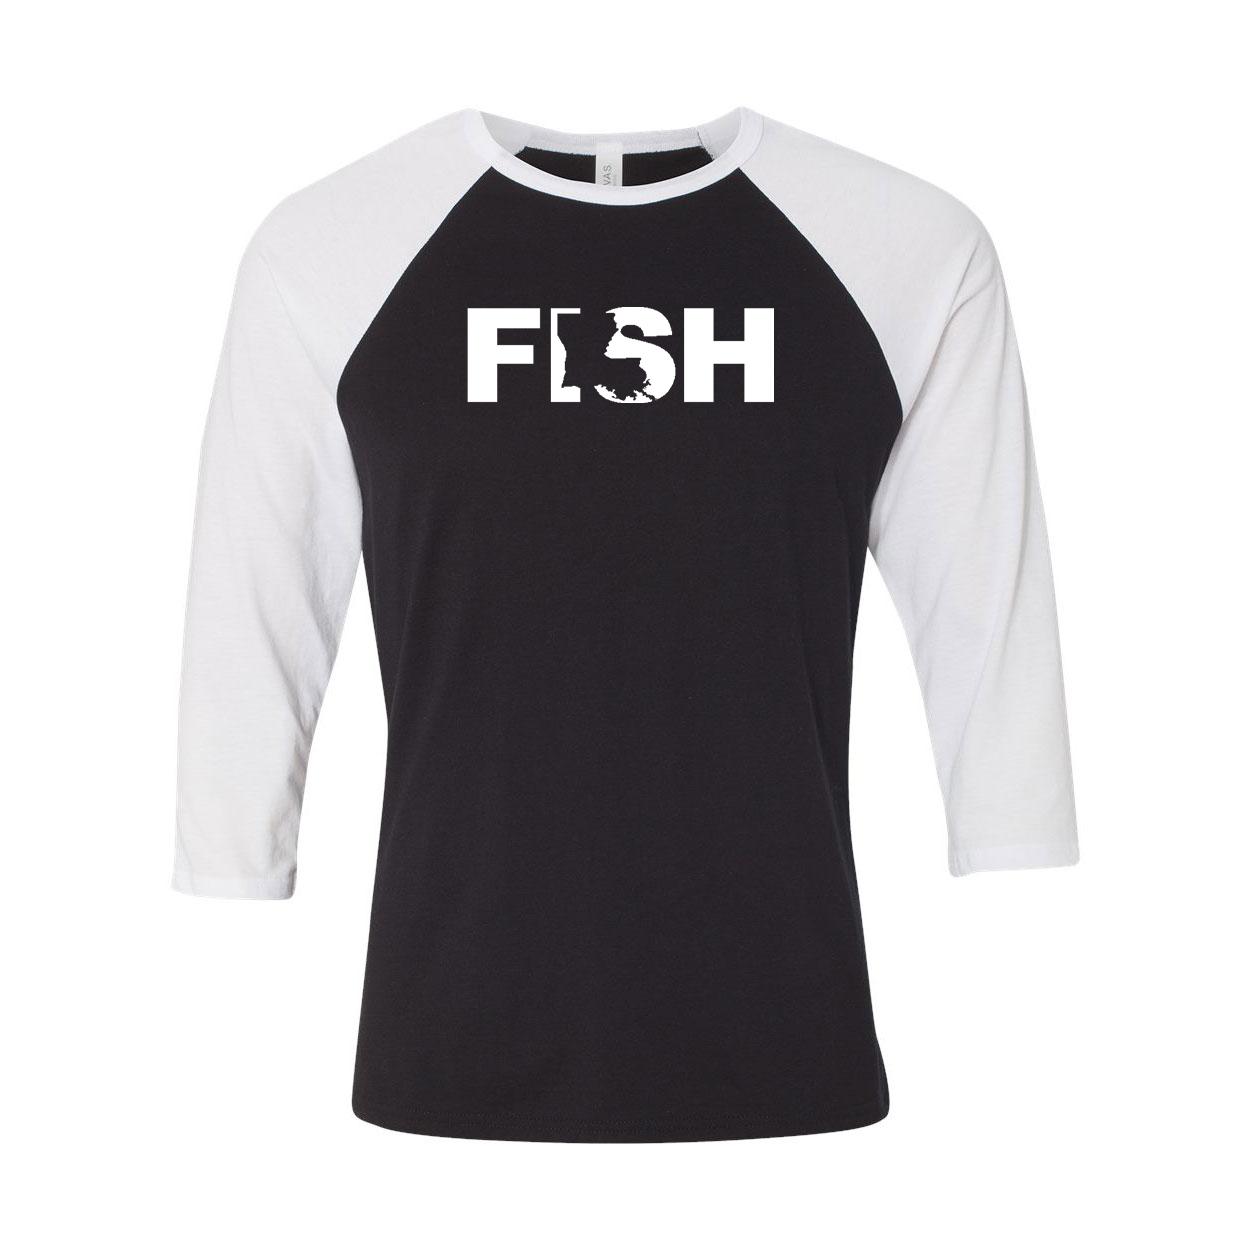 Fish Louisiana Classic Raglan Shirt Black/White (White Logo)